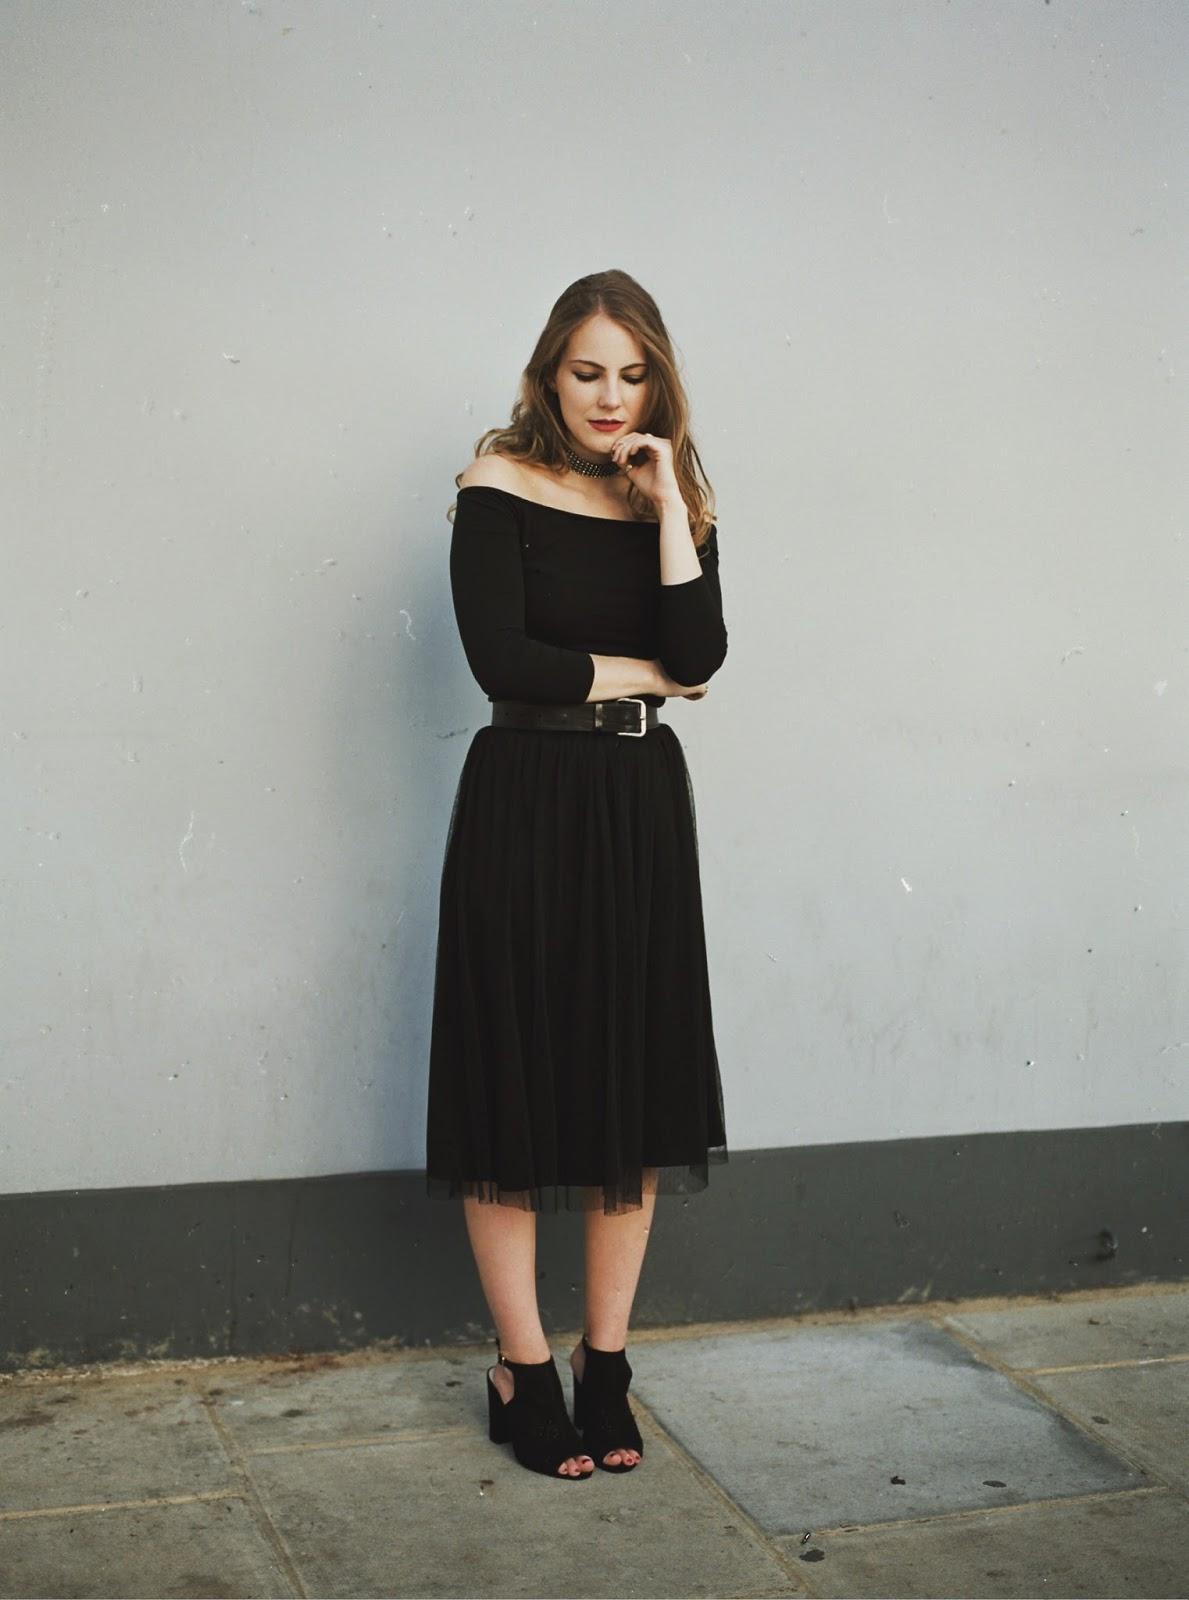 long tulle skirt, black tulle skirt, tulle skirt, black tutu skirt, how to wear tulle skirt